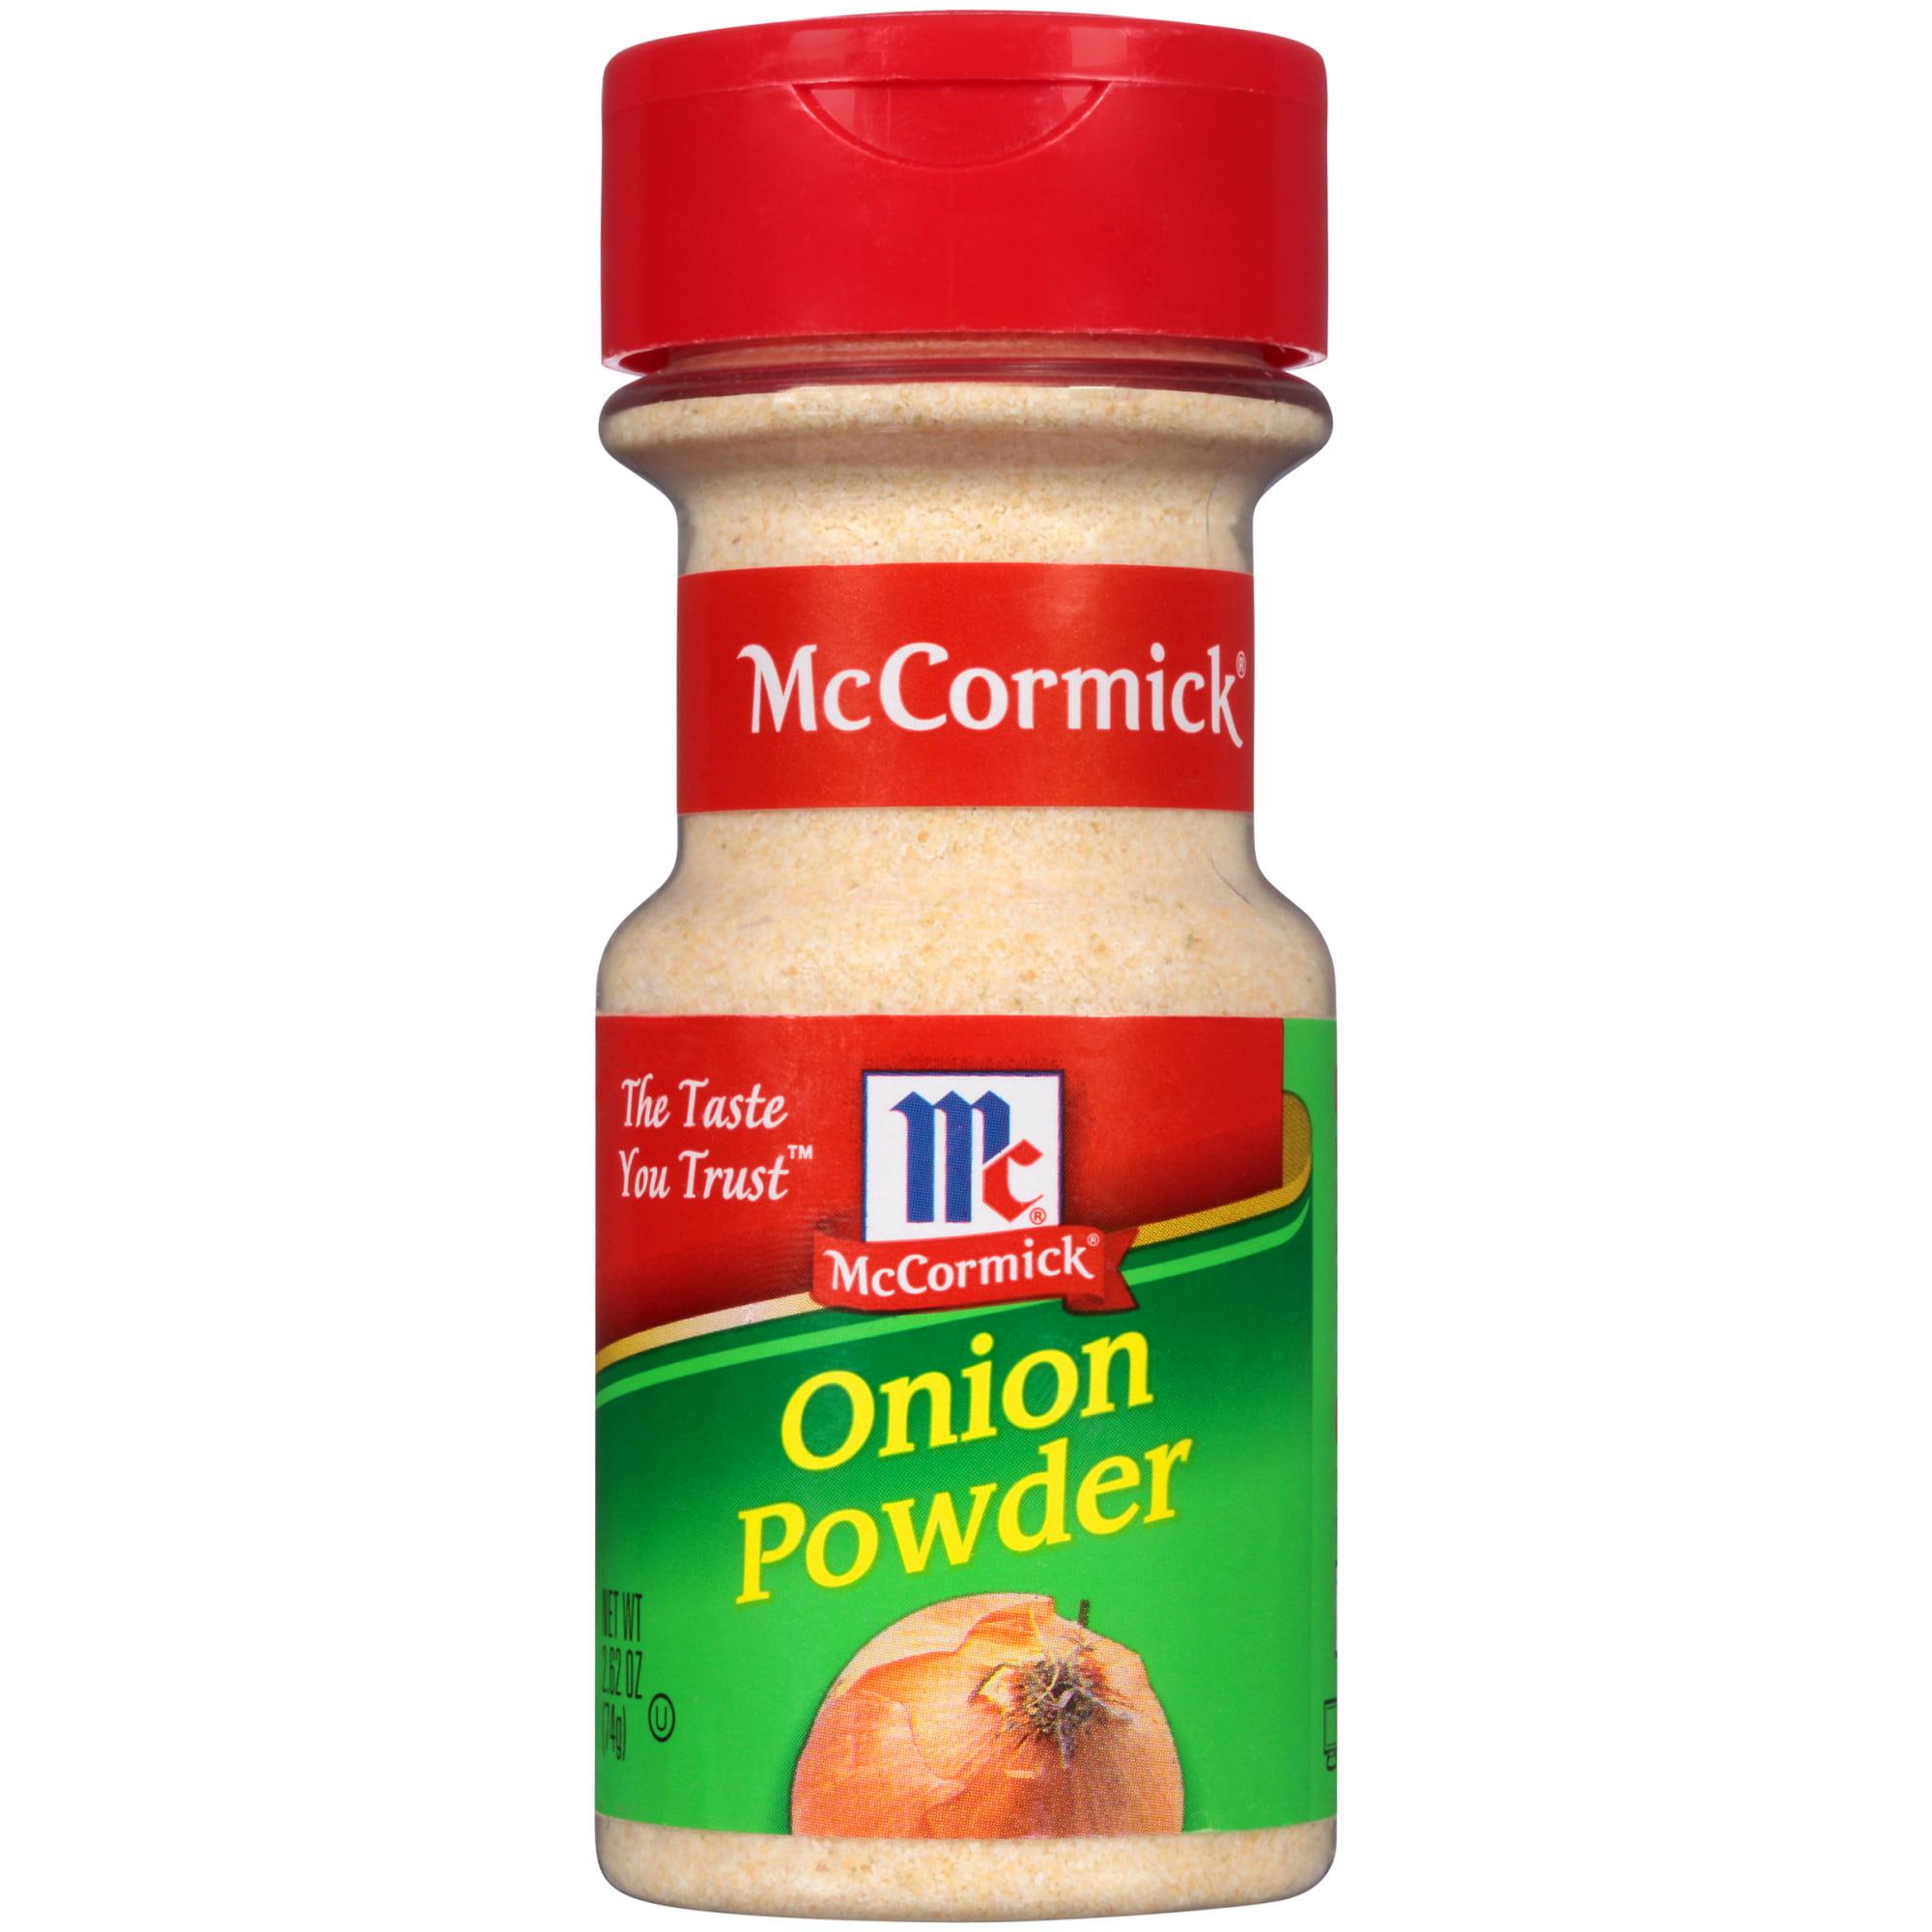 (2 Pack) McCormick Onion Powder, 2.62 oz